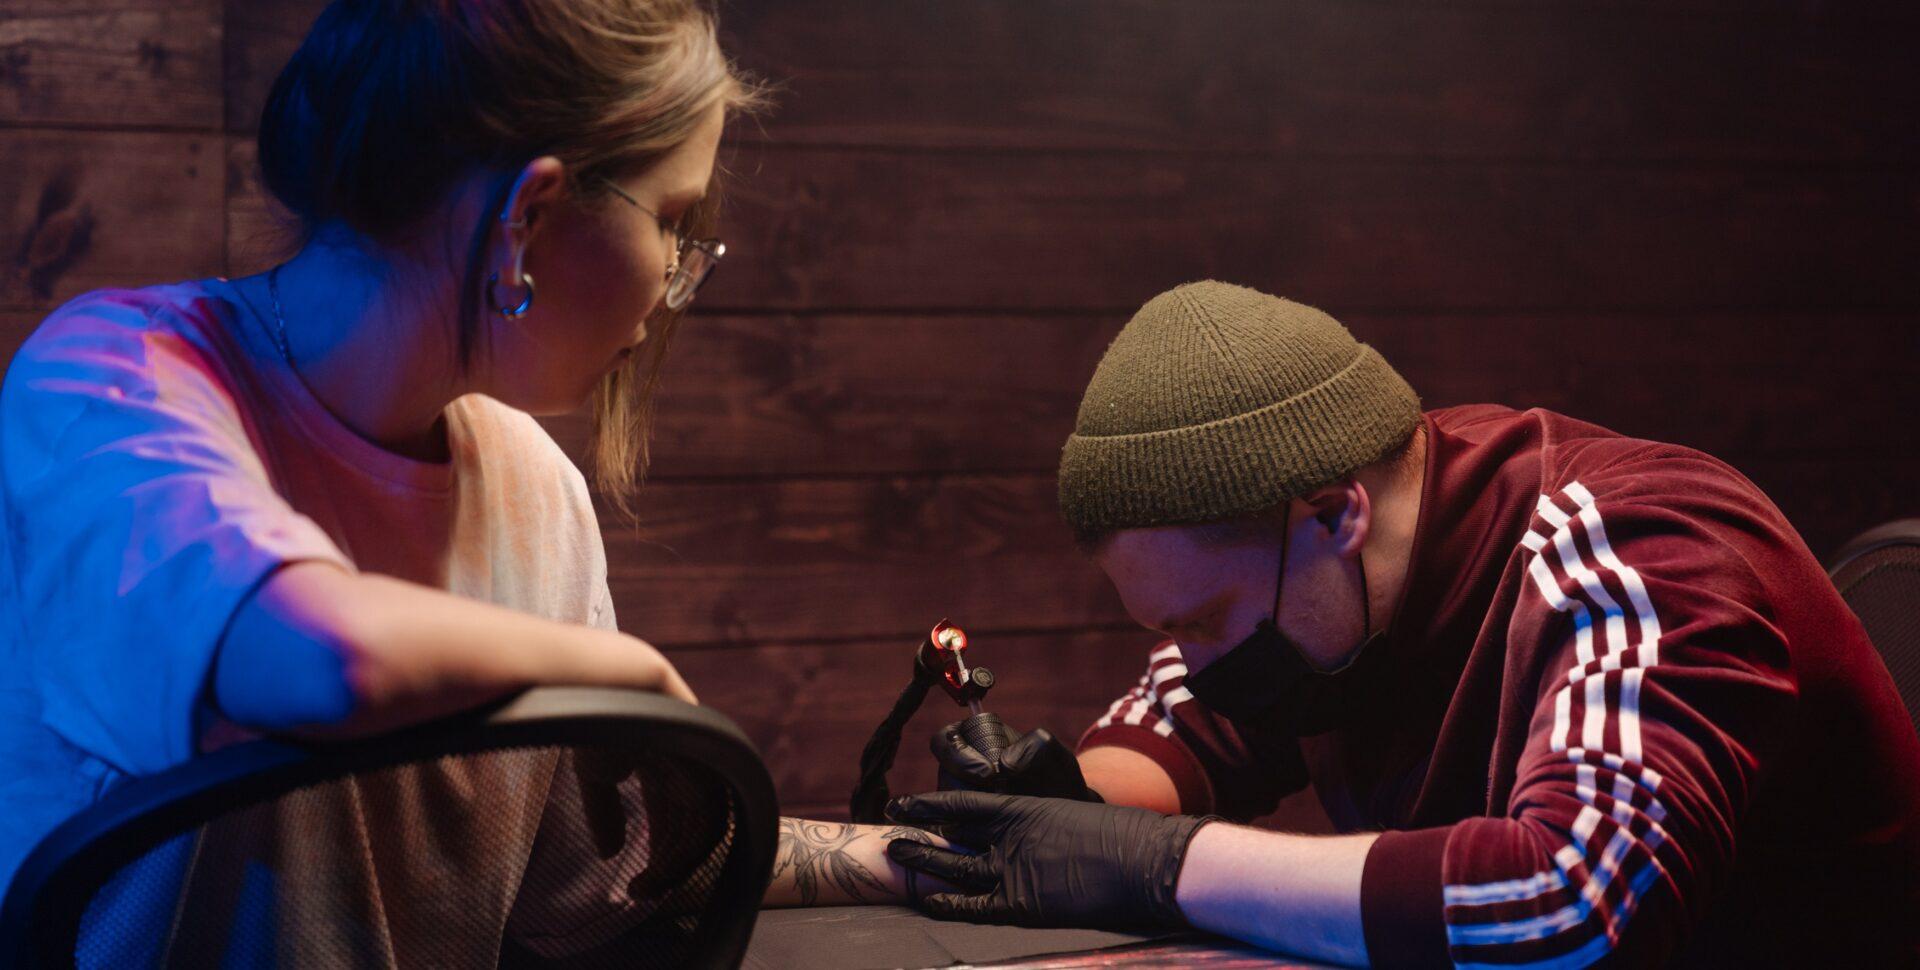 Tatuajes de Marihuana